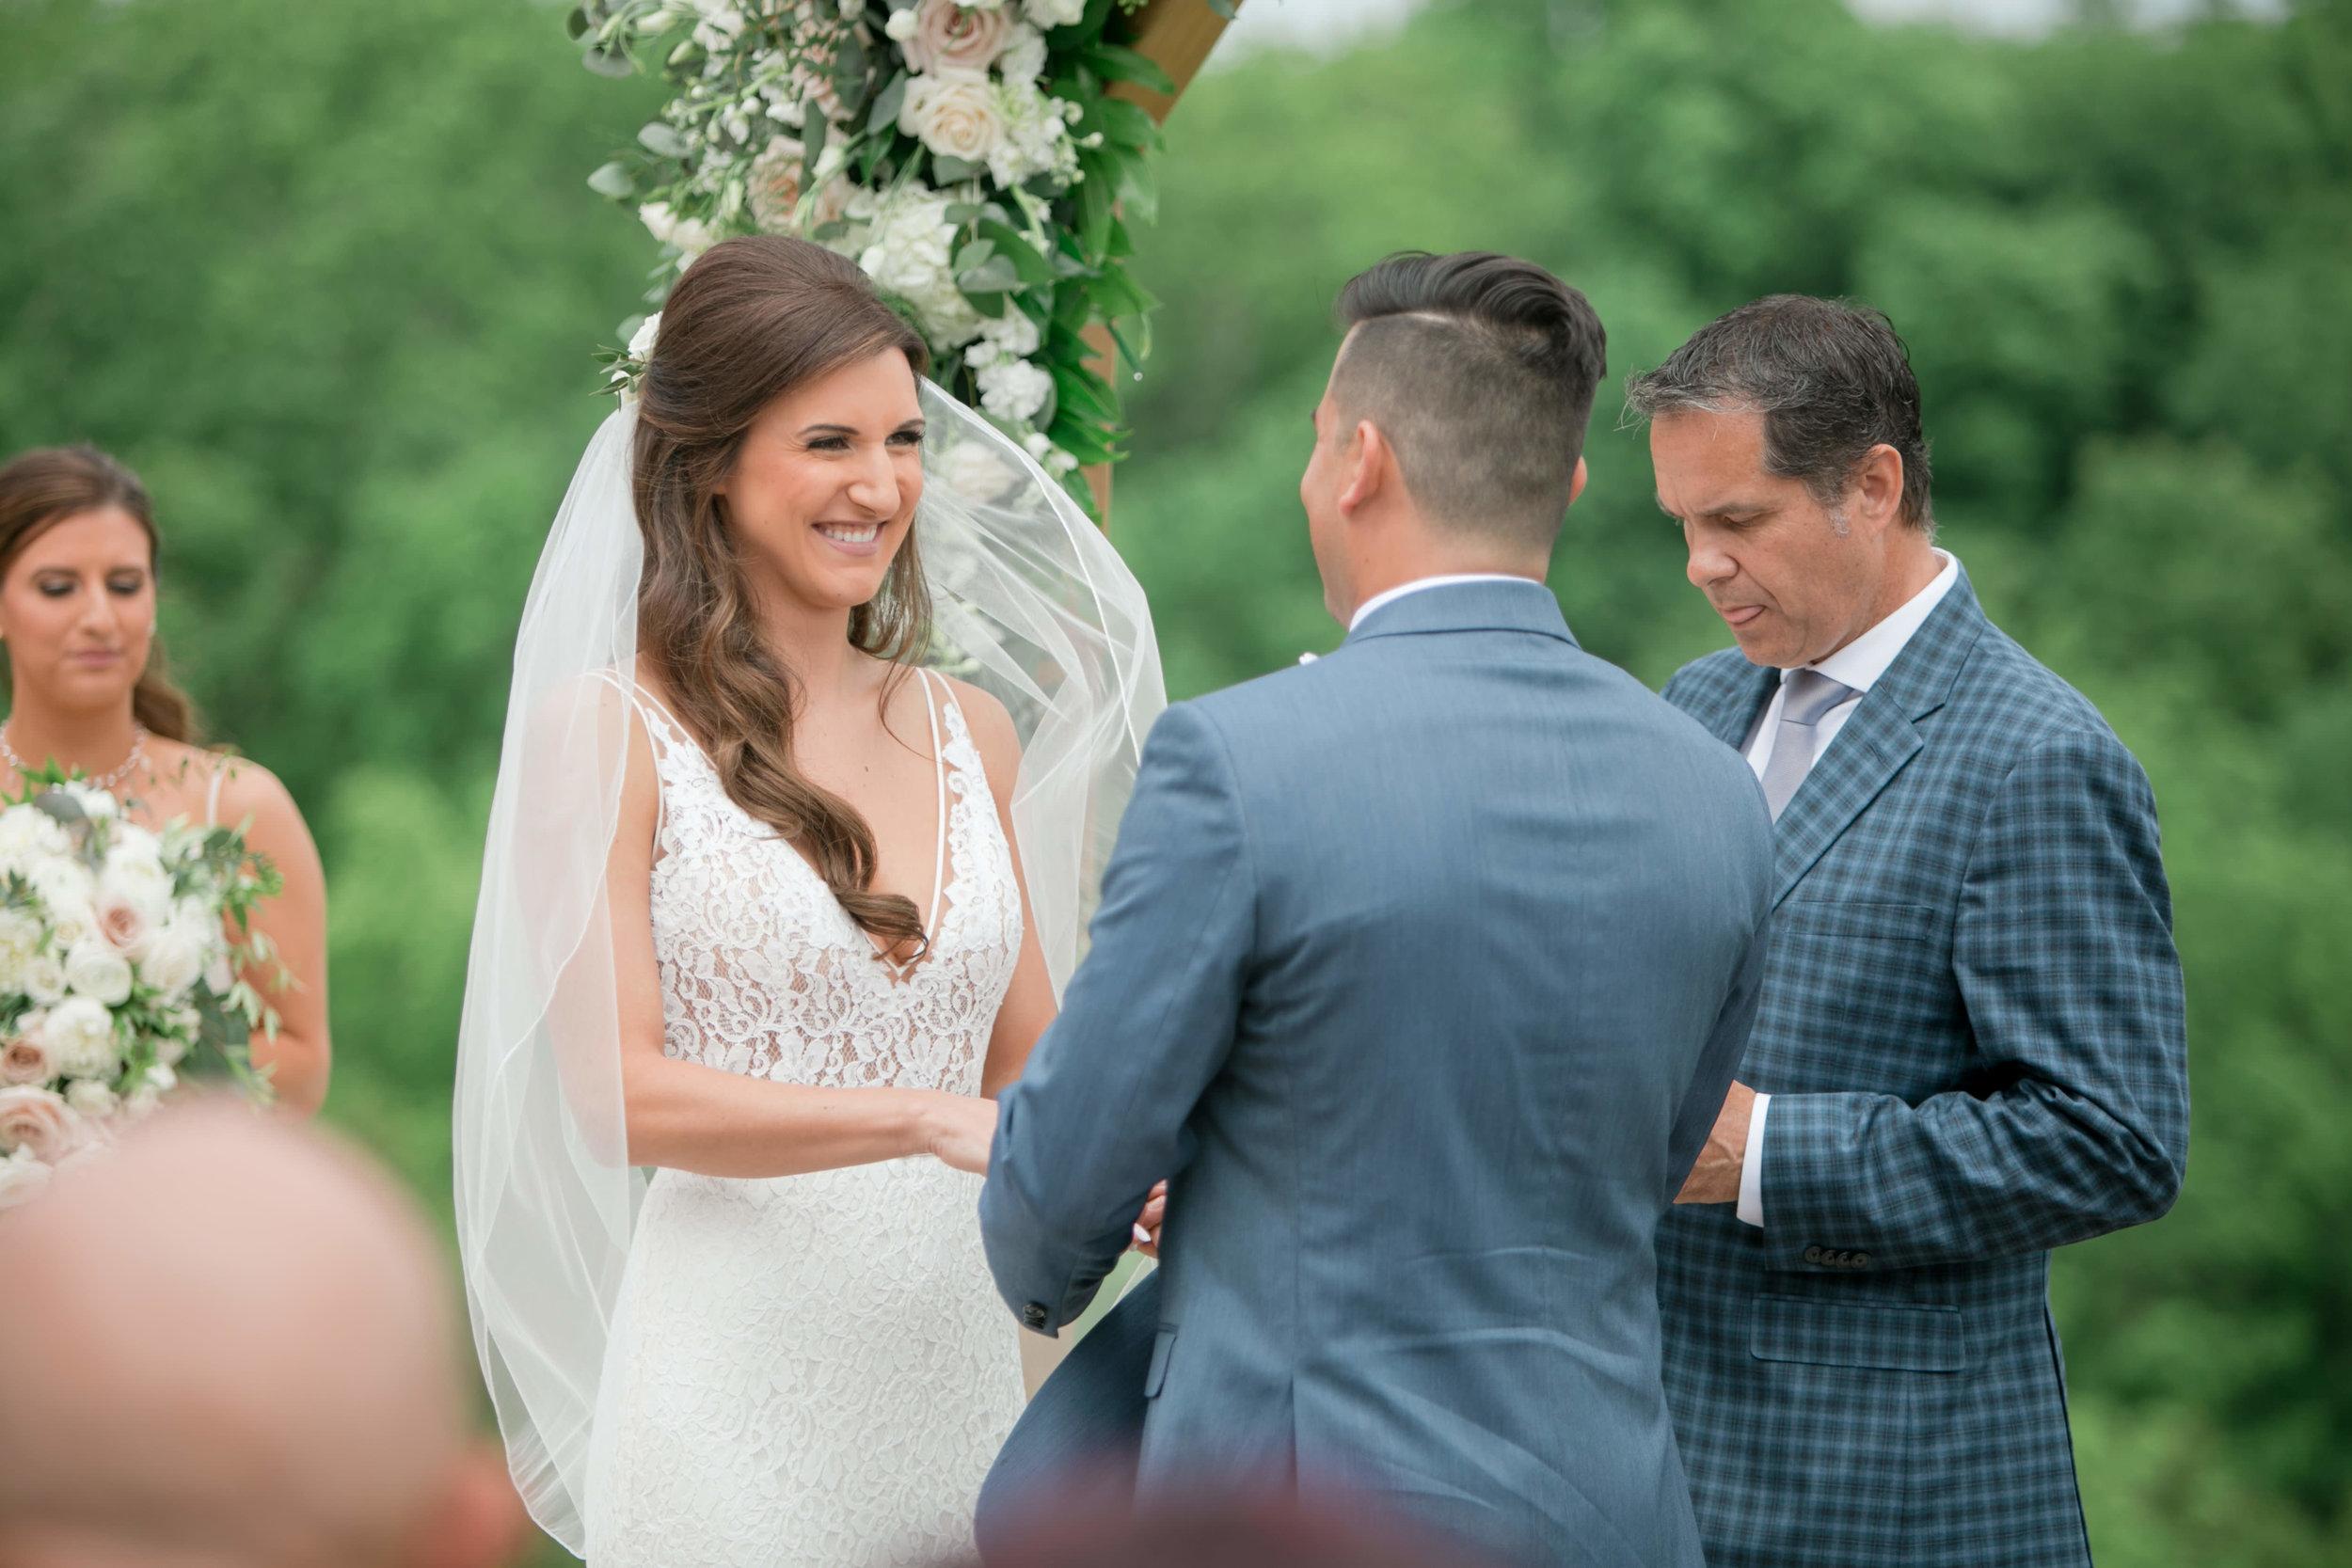 Miranda___Daniel___Daniel_Ricci_Weddings___High_Res._Finals_314.jpg